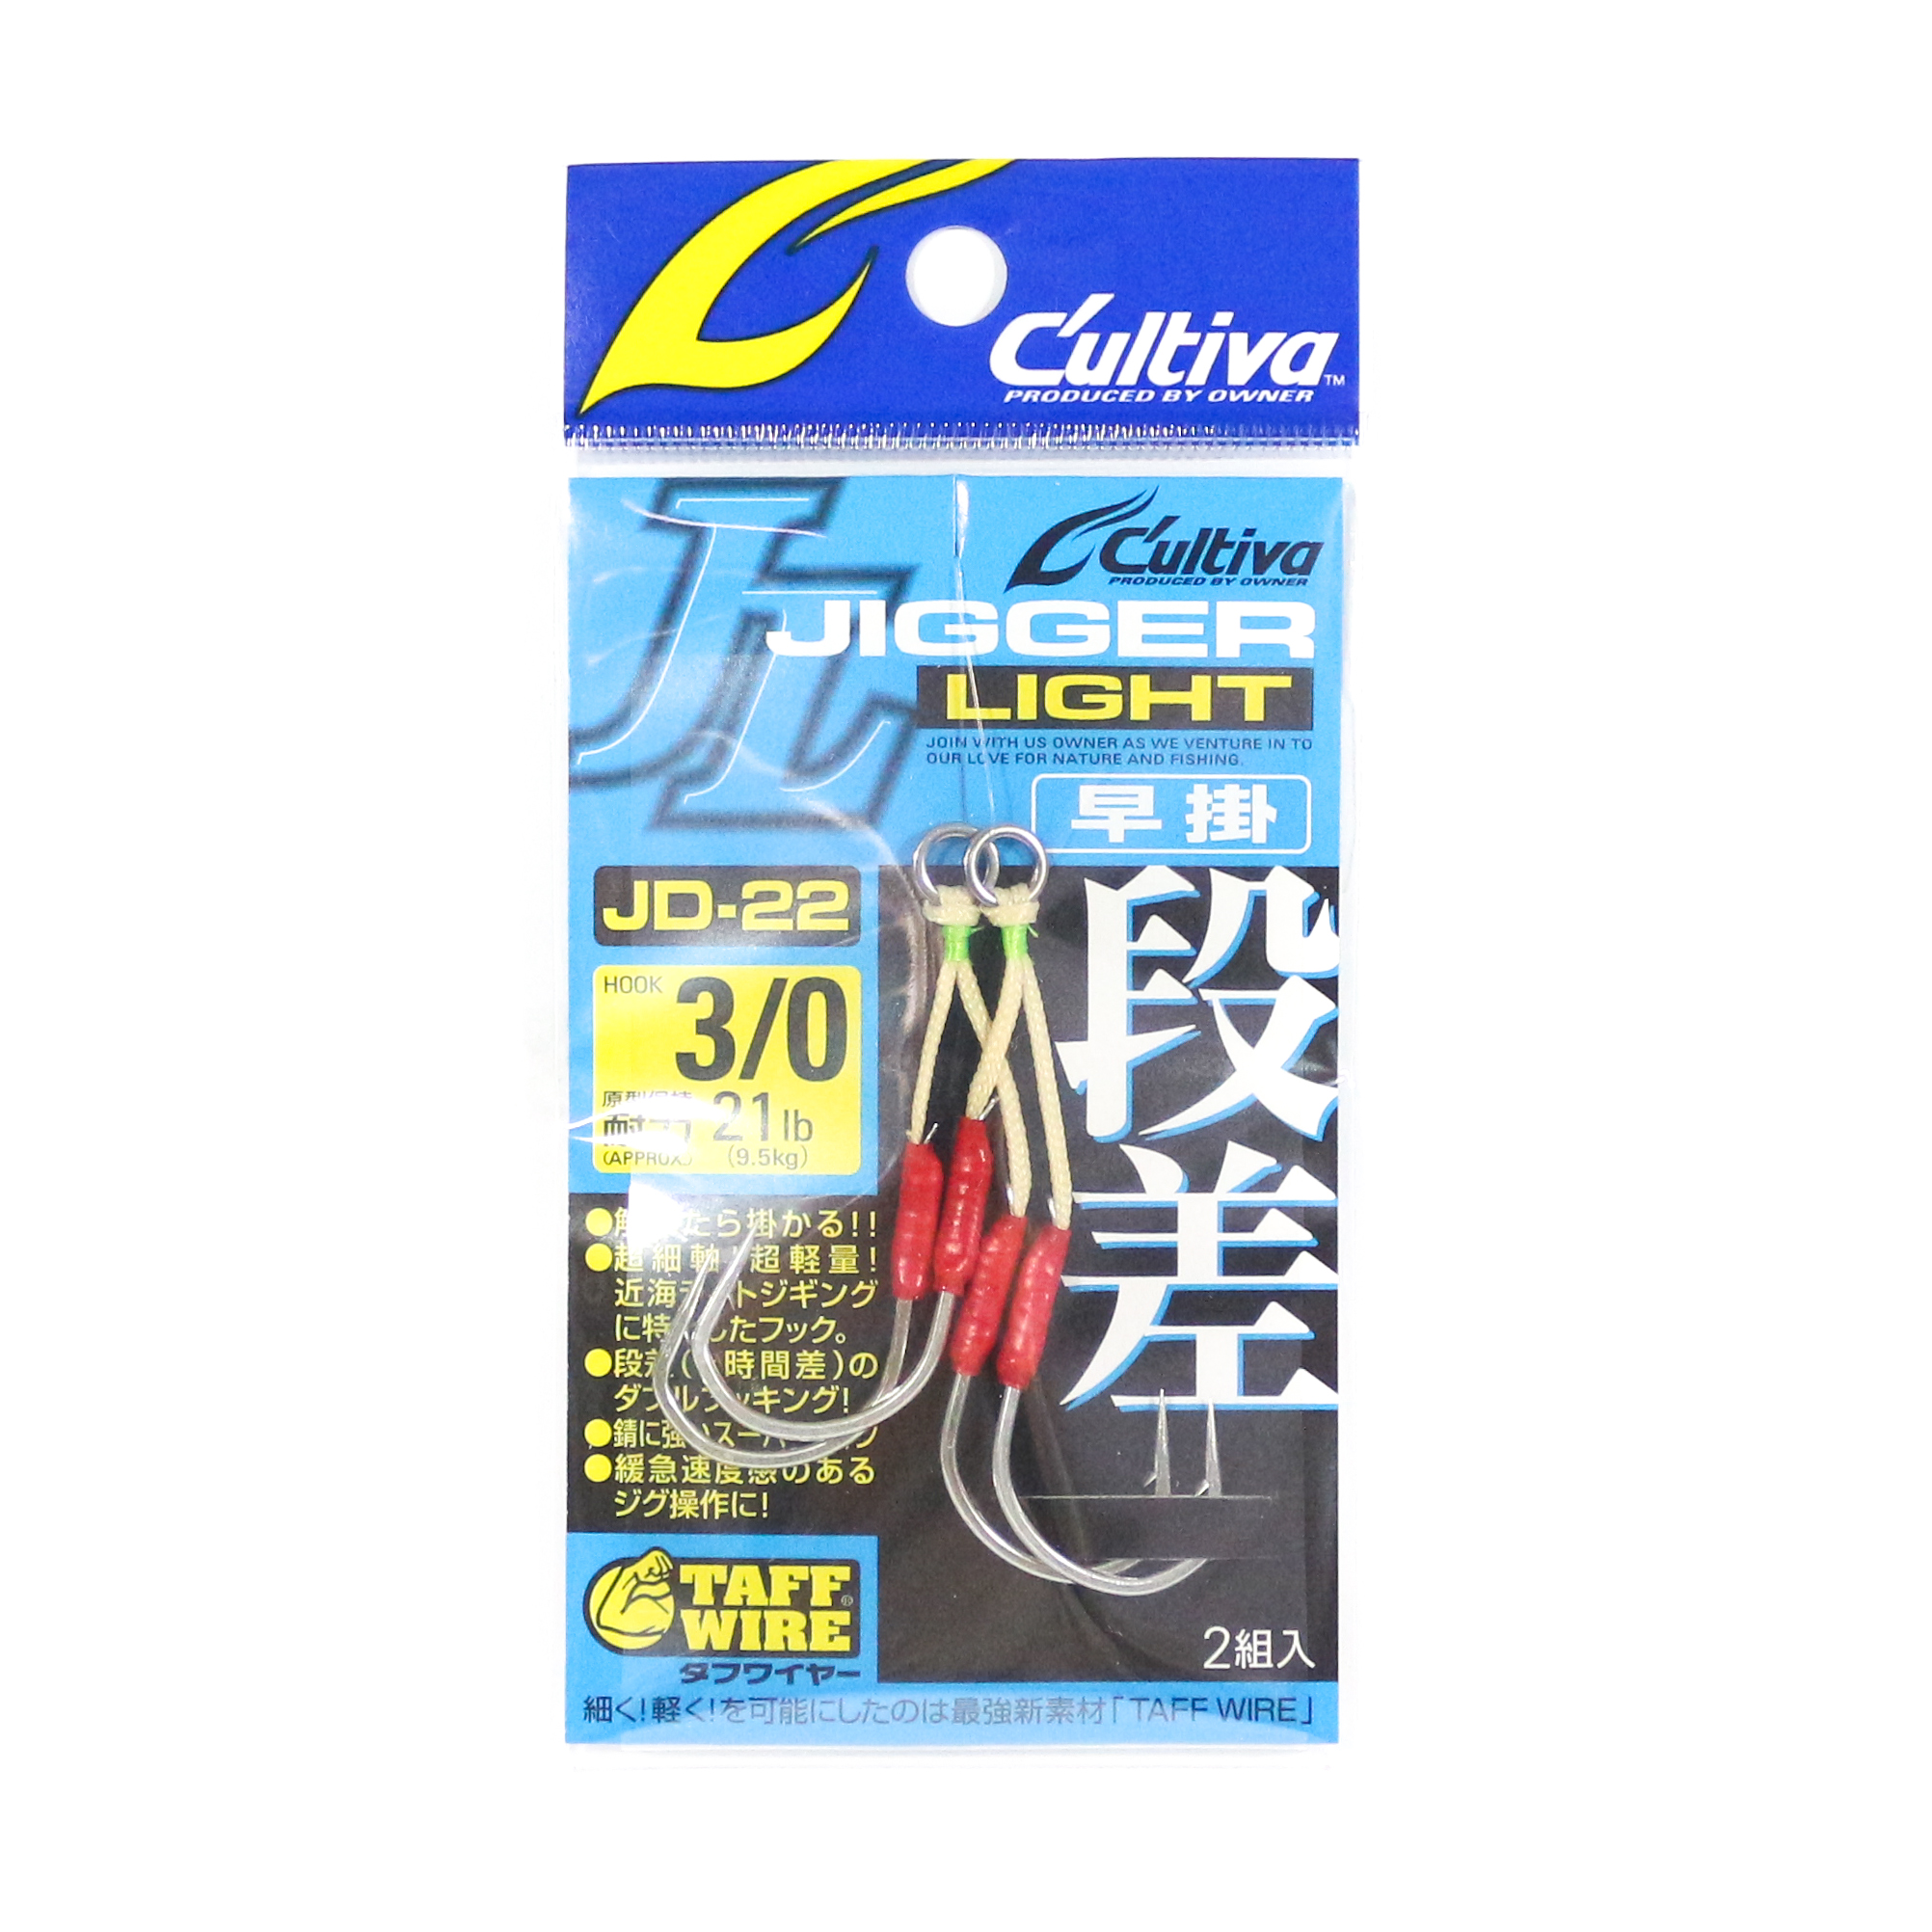 Owner JD-22 Jigger Light Twin Assist Hooks Size 3/0 (8870)